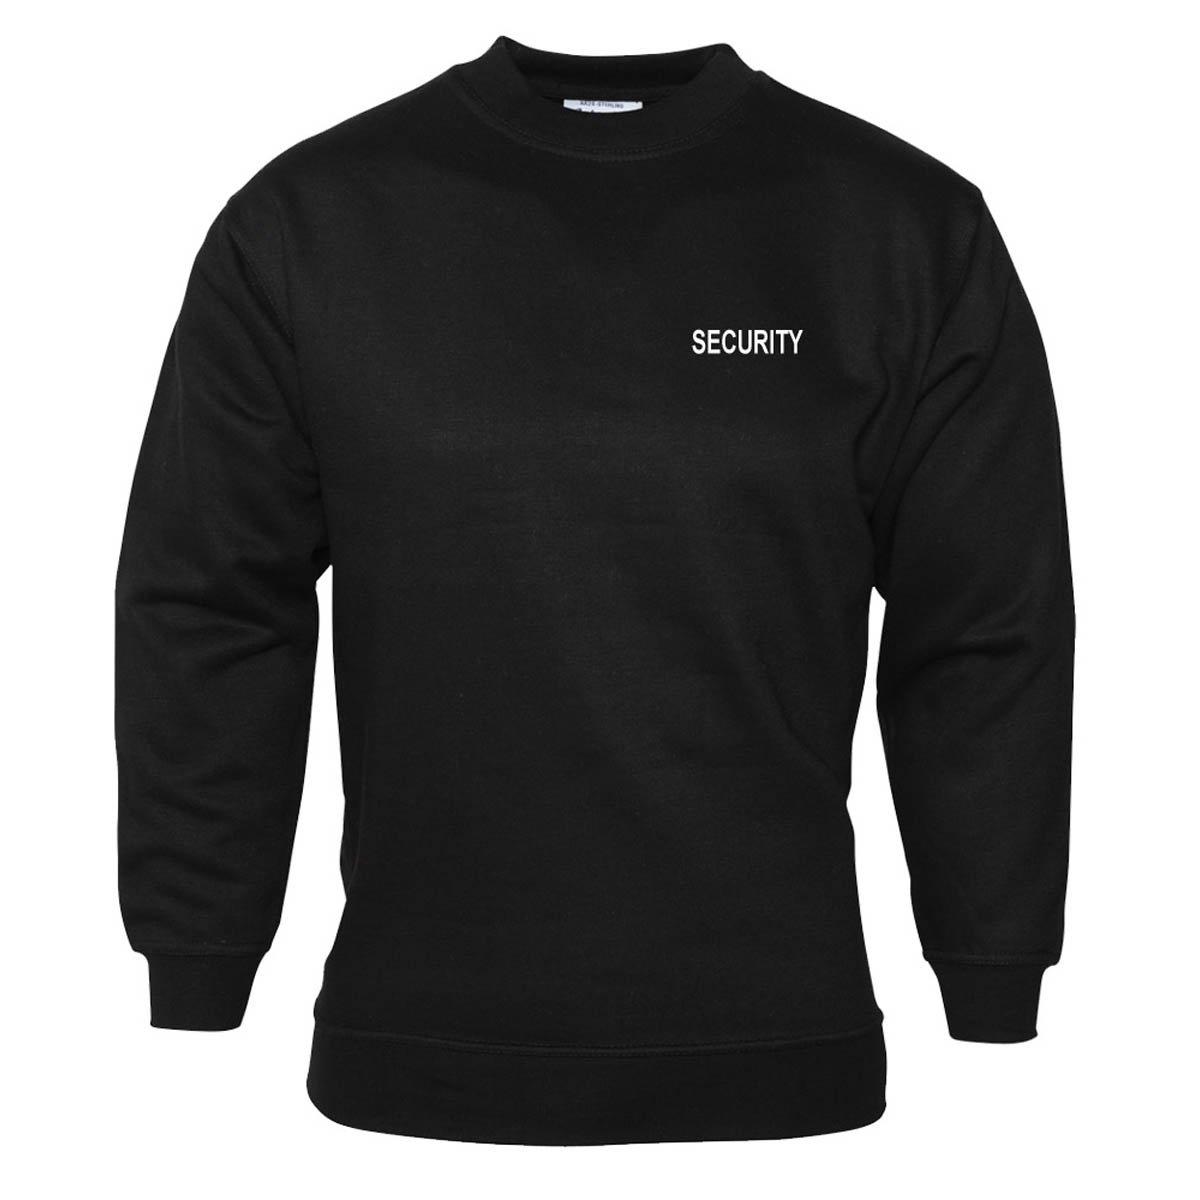 Workwear World Security Embroidered Doorman Bouncer Set-in Sleeve Black Sweatshirt